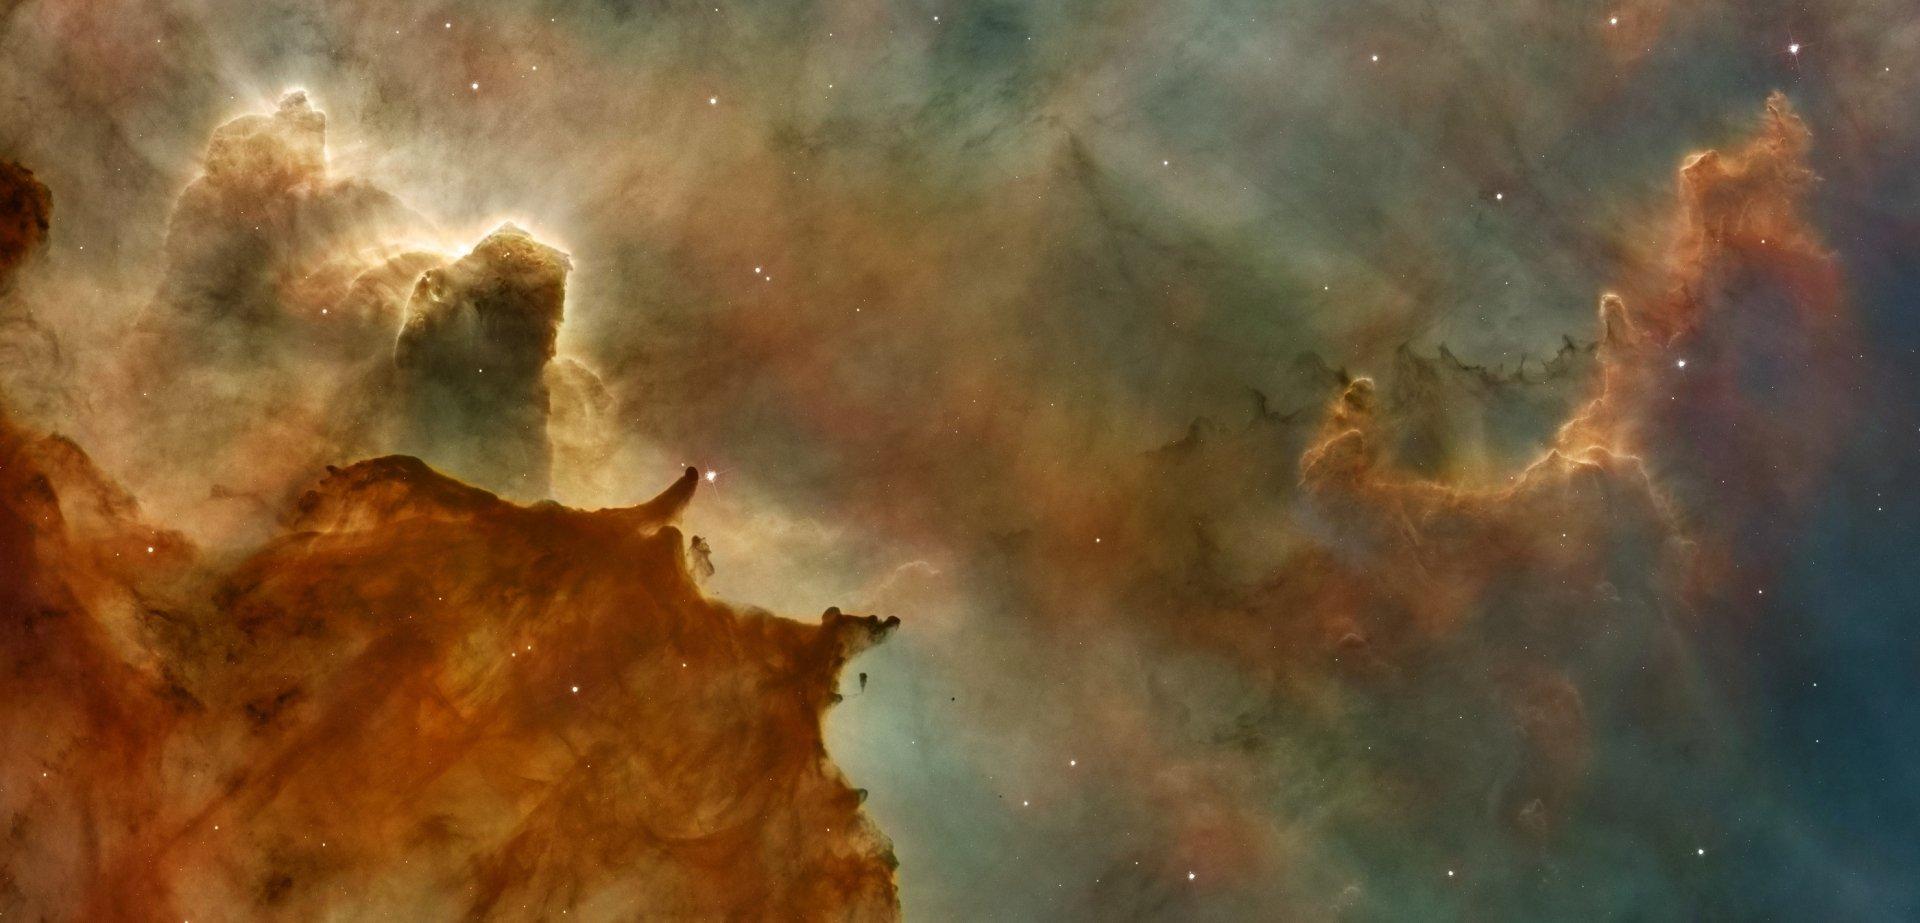 Sci Fi - Nebula  Carina Nebula Space Sci Fi Wallpaper